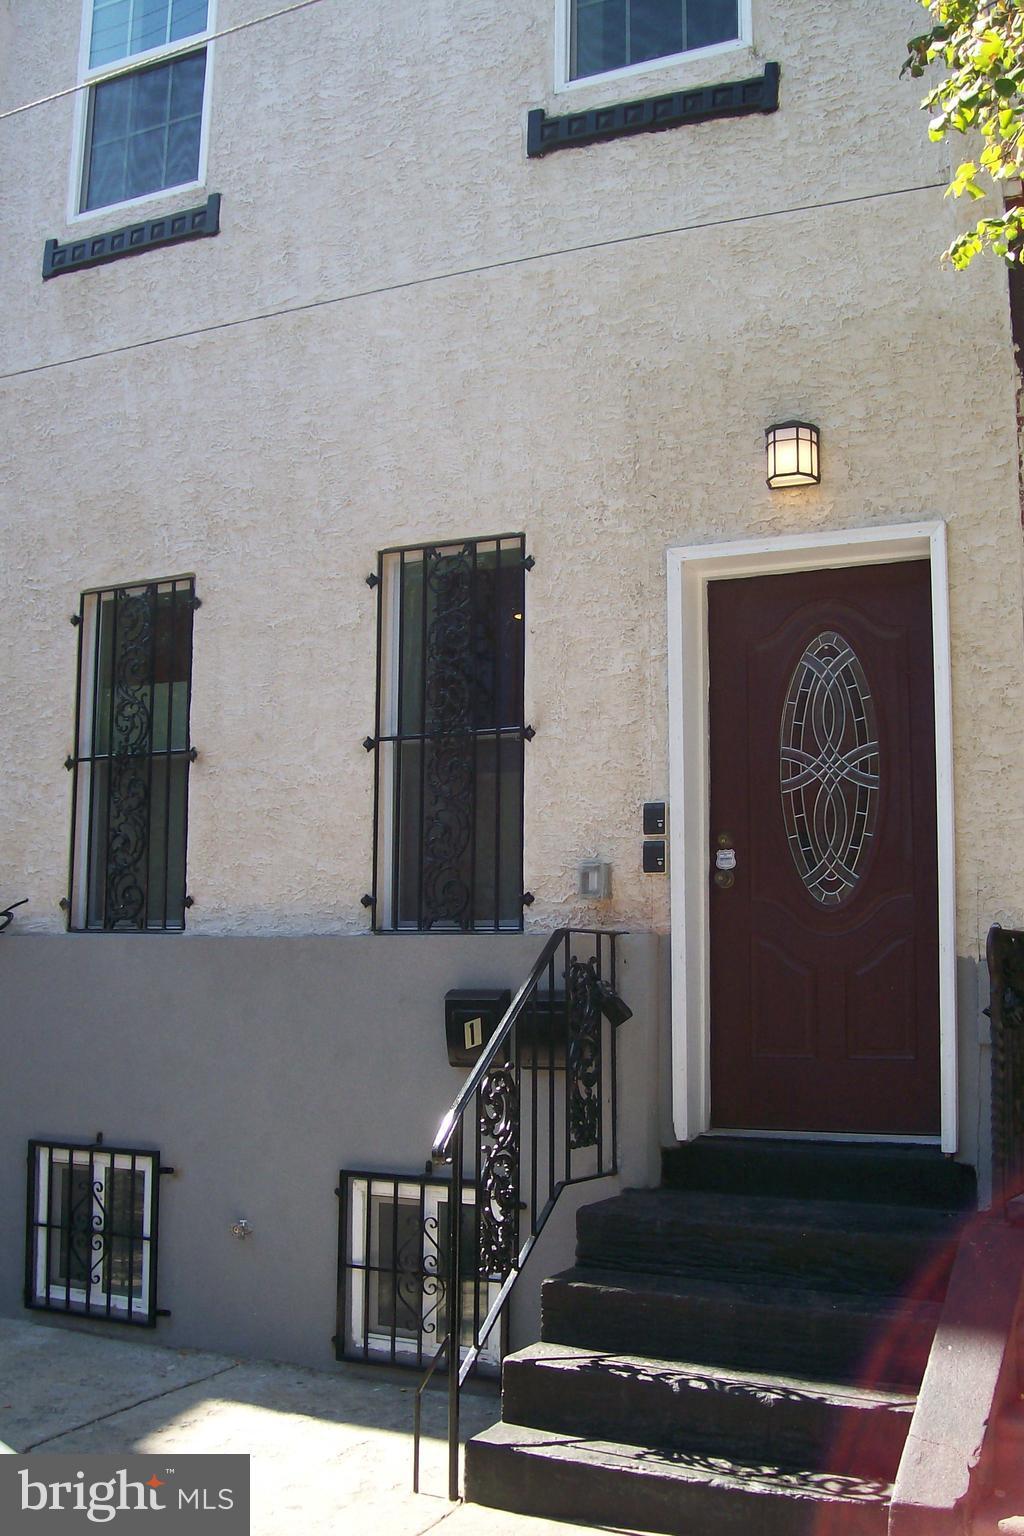 2554 N 8TH STREET, PHILADELPHIA, PA 19133